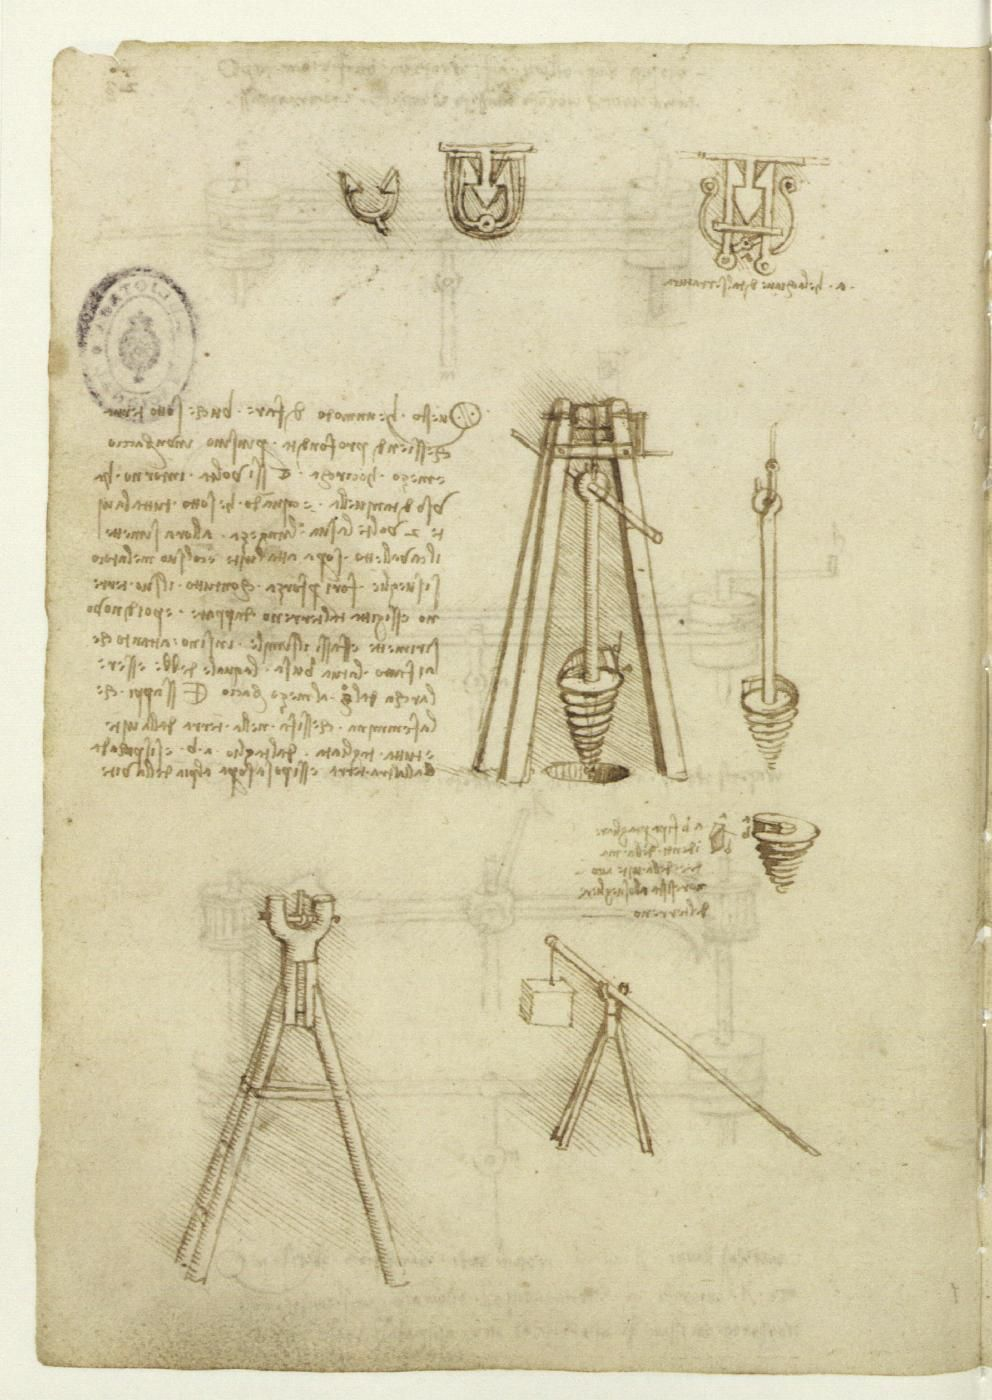 impact of leonardo da vincis inventions leonardo di ser piero da vinci, 15 april 1452 - 2 may 1519, was an italian polymath he was a painter, a sculptor, an architect, a musician, a mathematician, a military-engineer, an inventor, an anatomist, a geologist, a cartographer, a botanist and a writer.